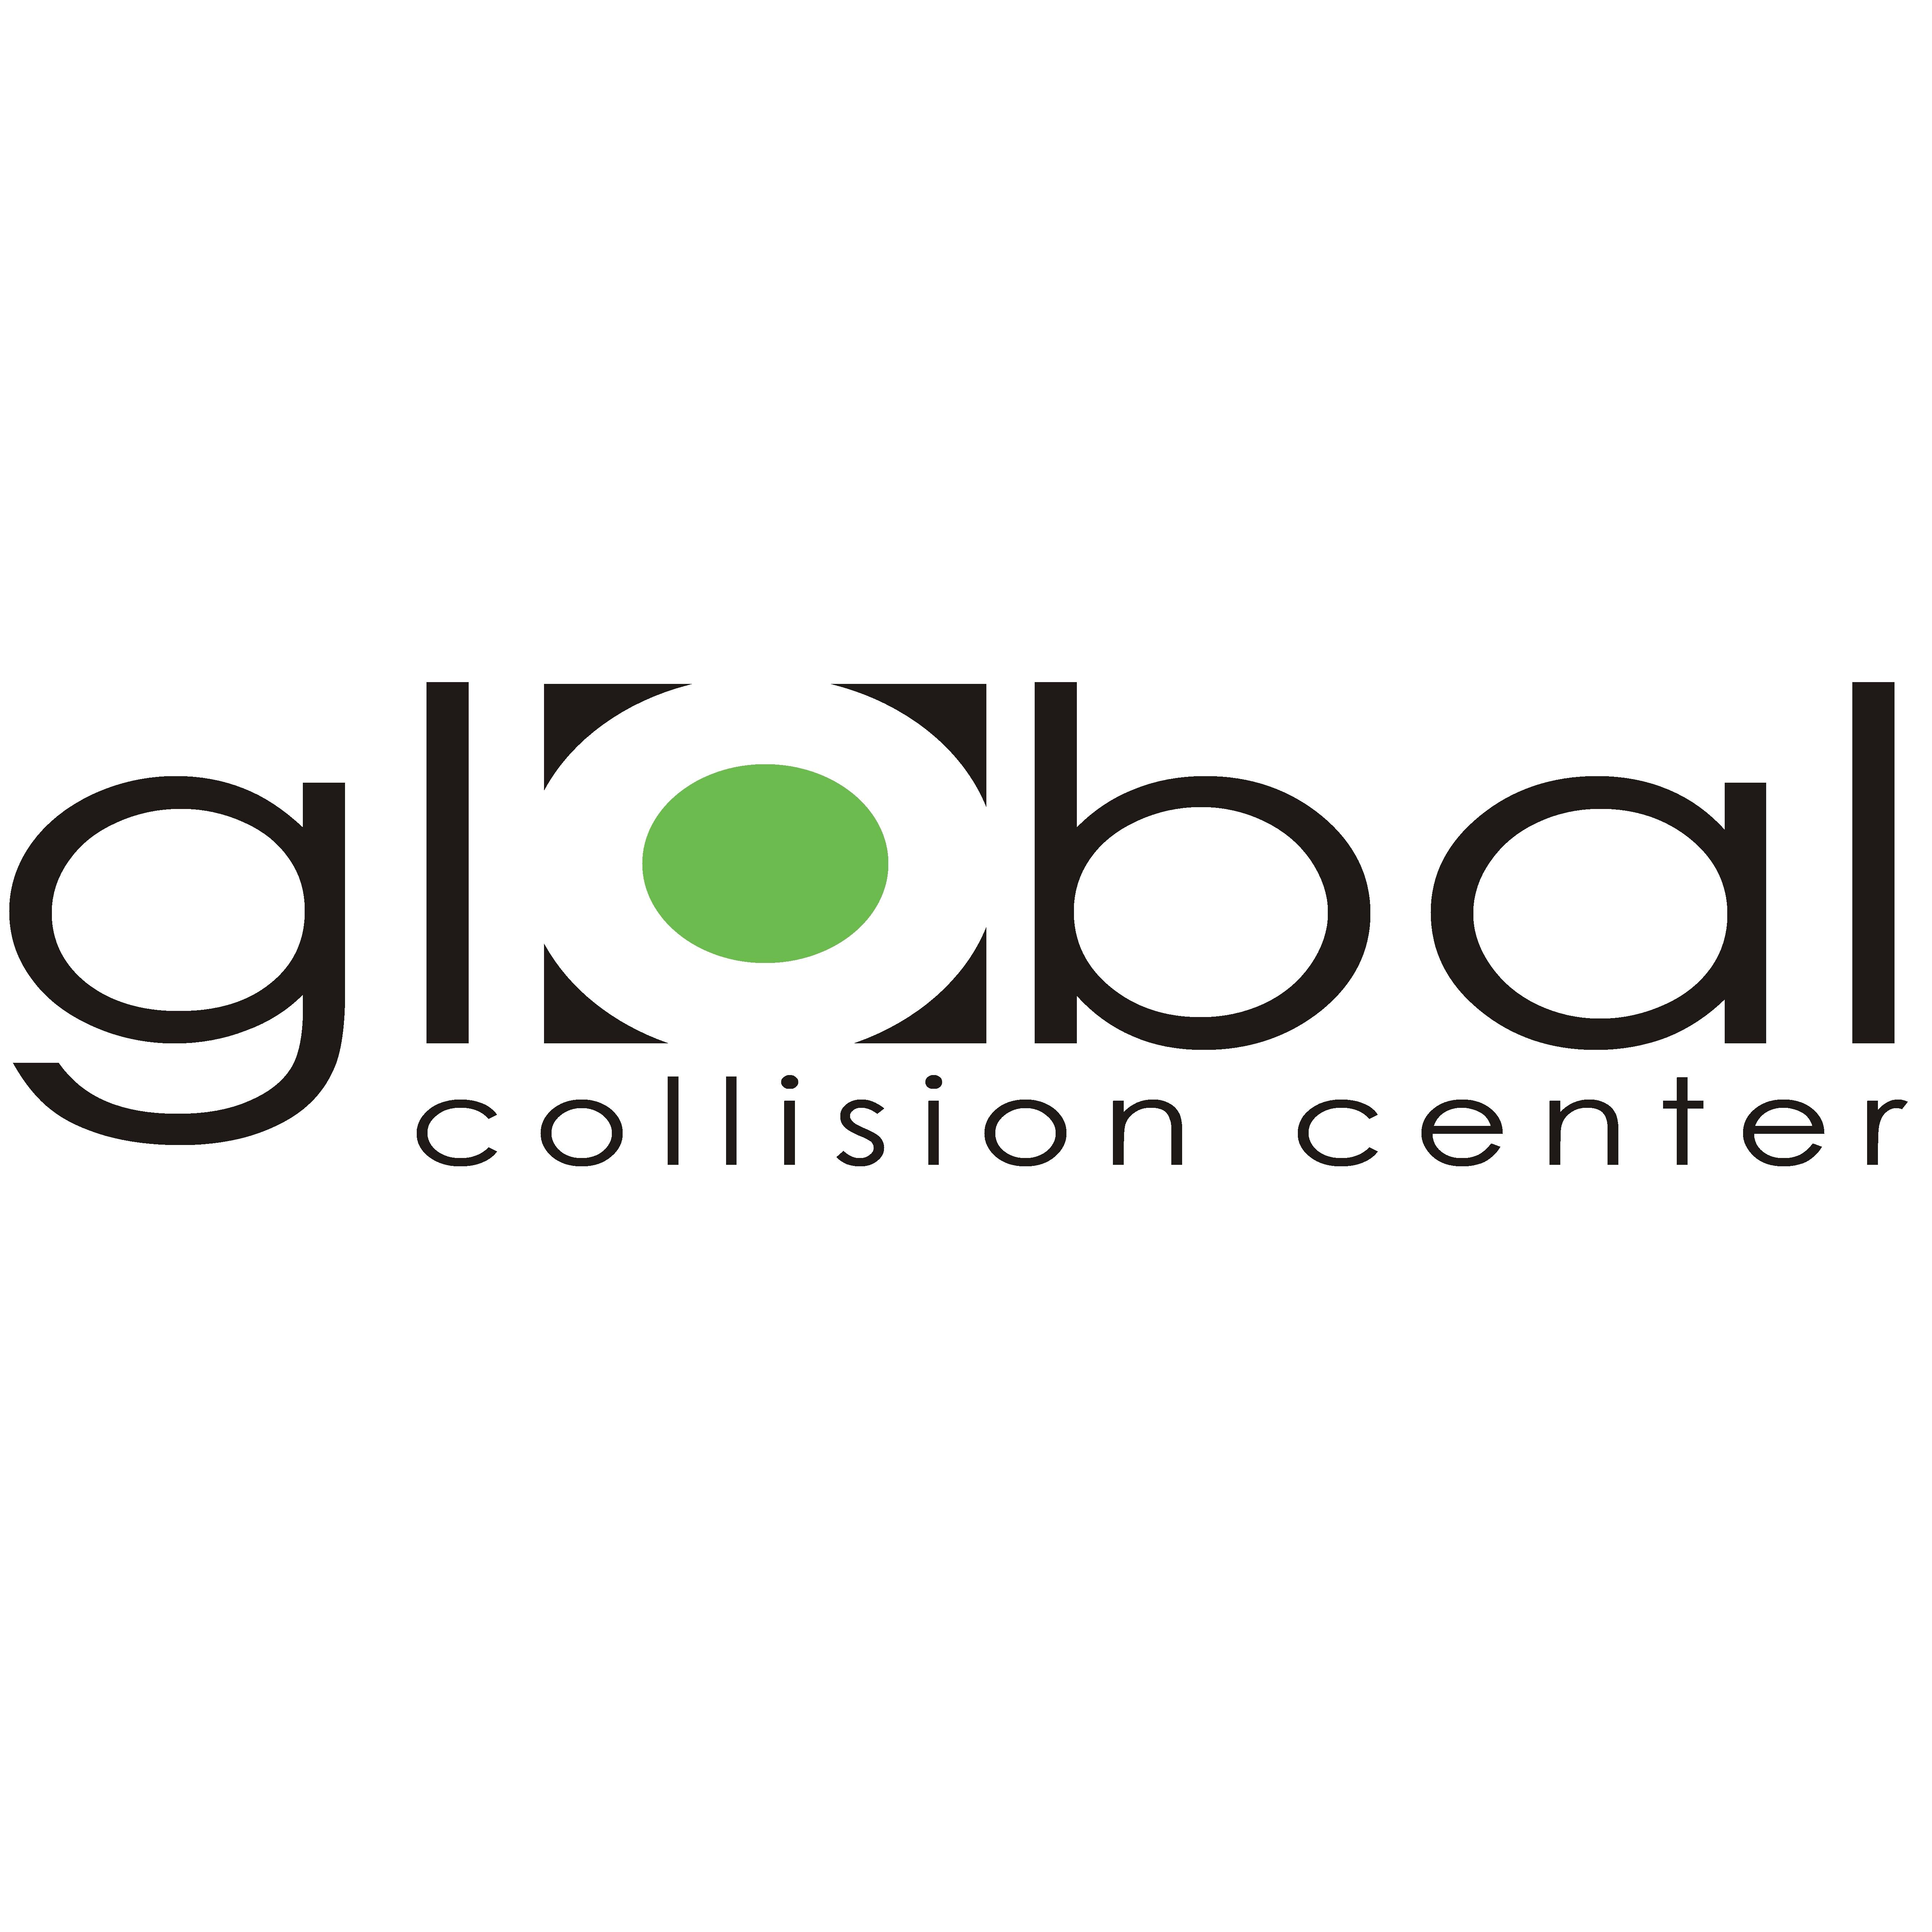 Global Collision Center In Garden Grove Ca 92843